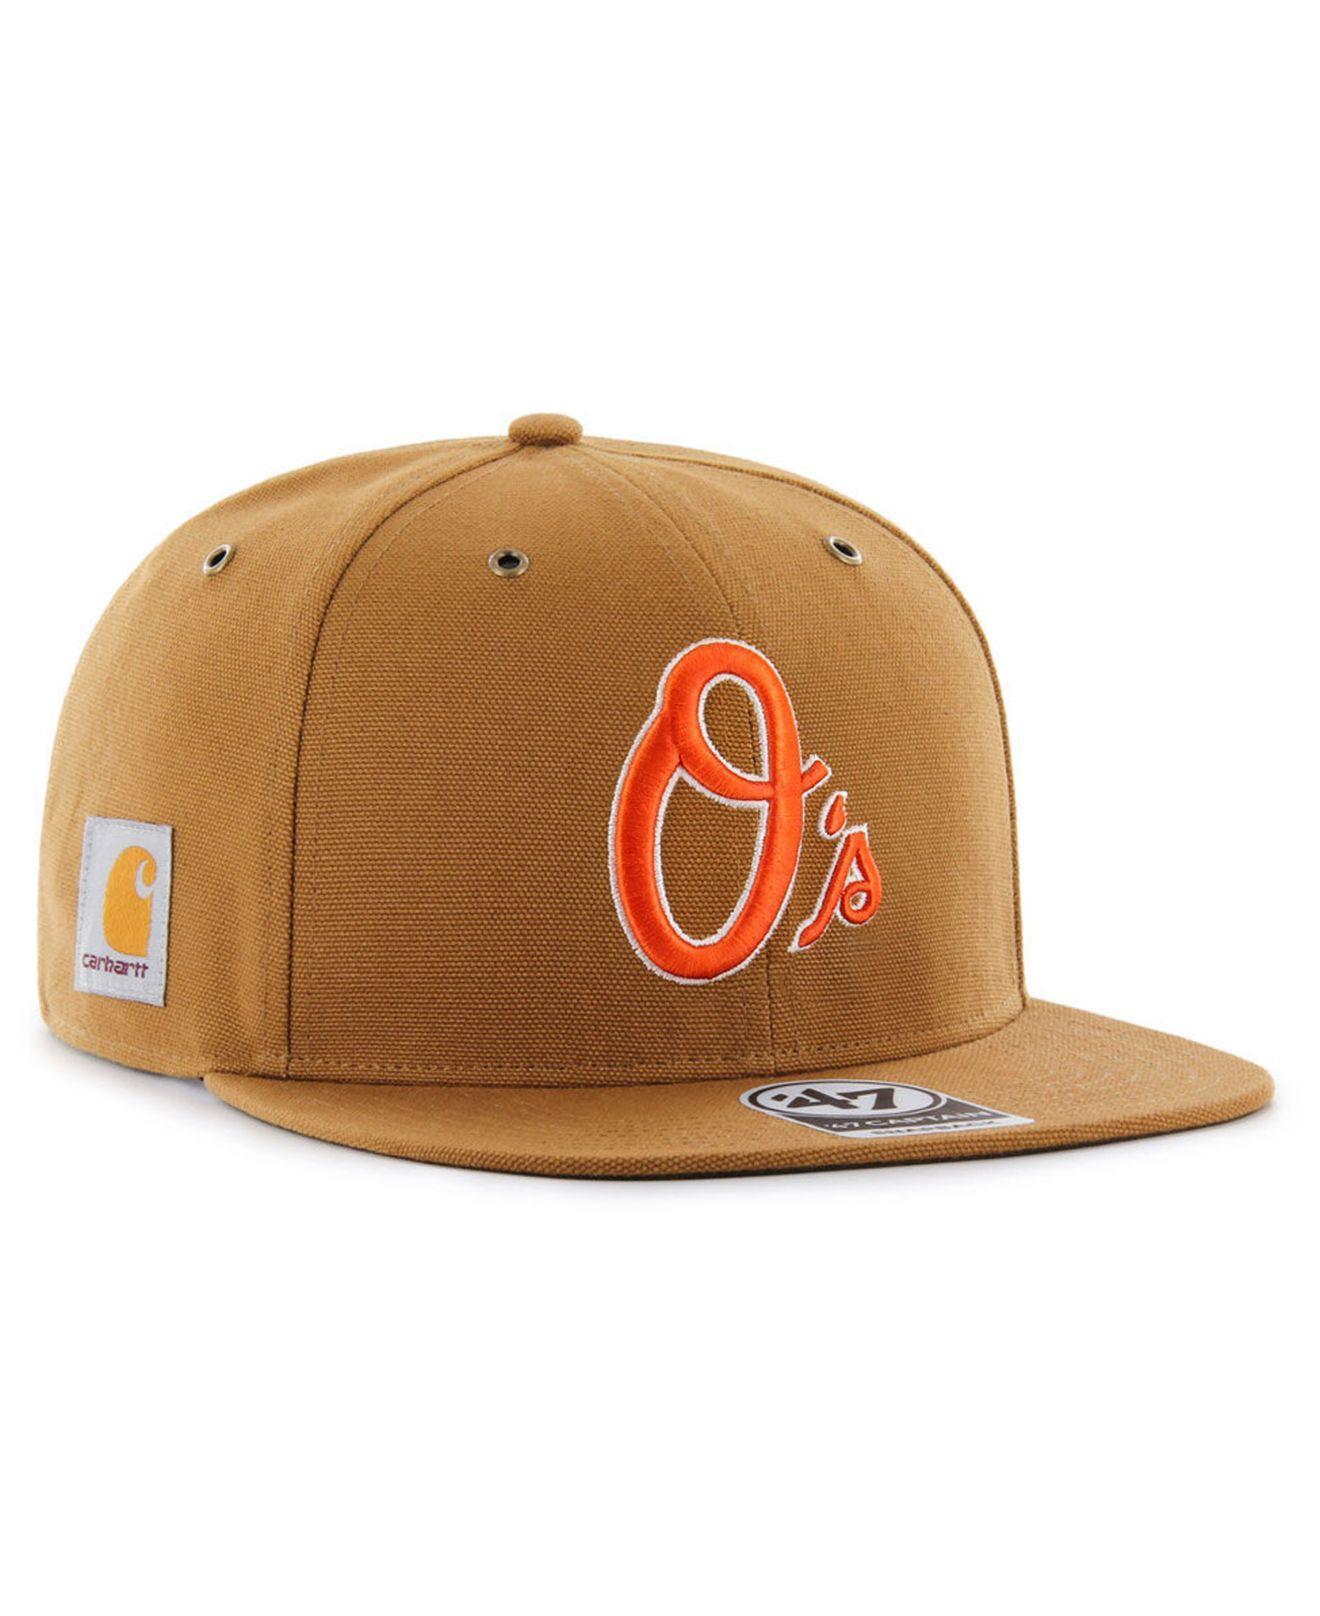 detailed look 62415 6bc97 Lyst - 47 Brand Baltimore Orioles Carhartt Captain Cap in Brown for Men